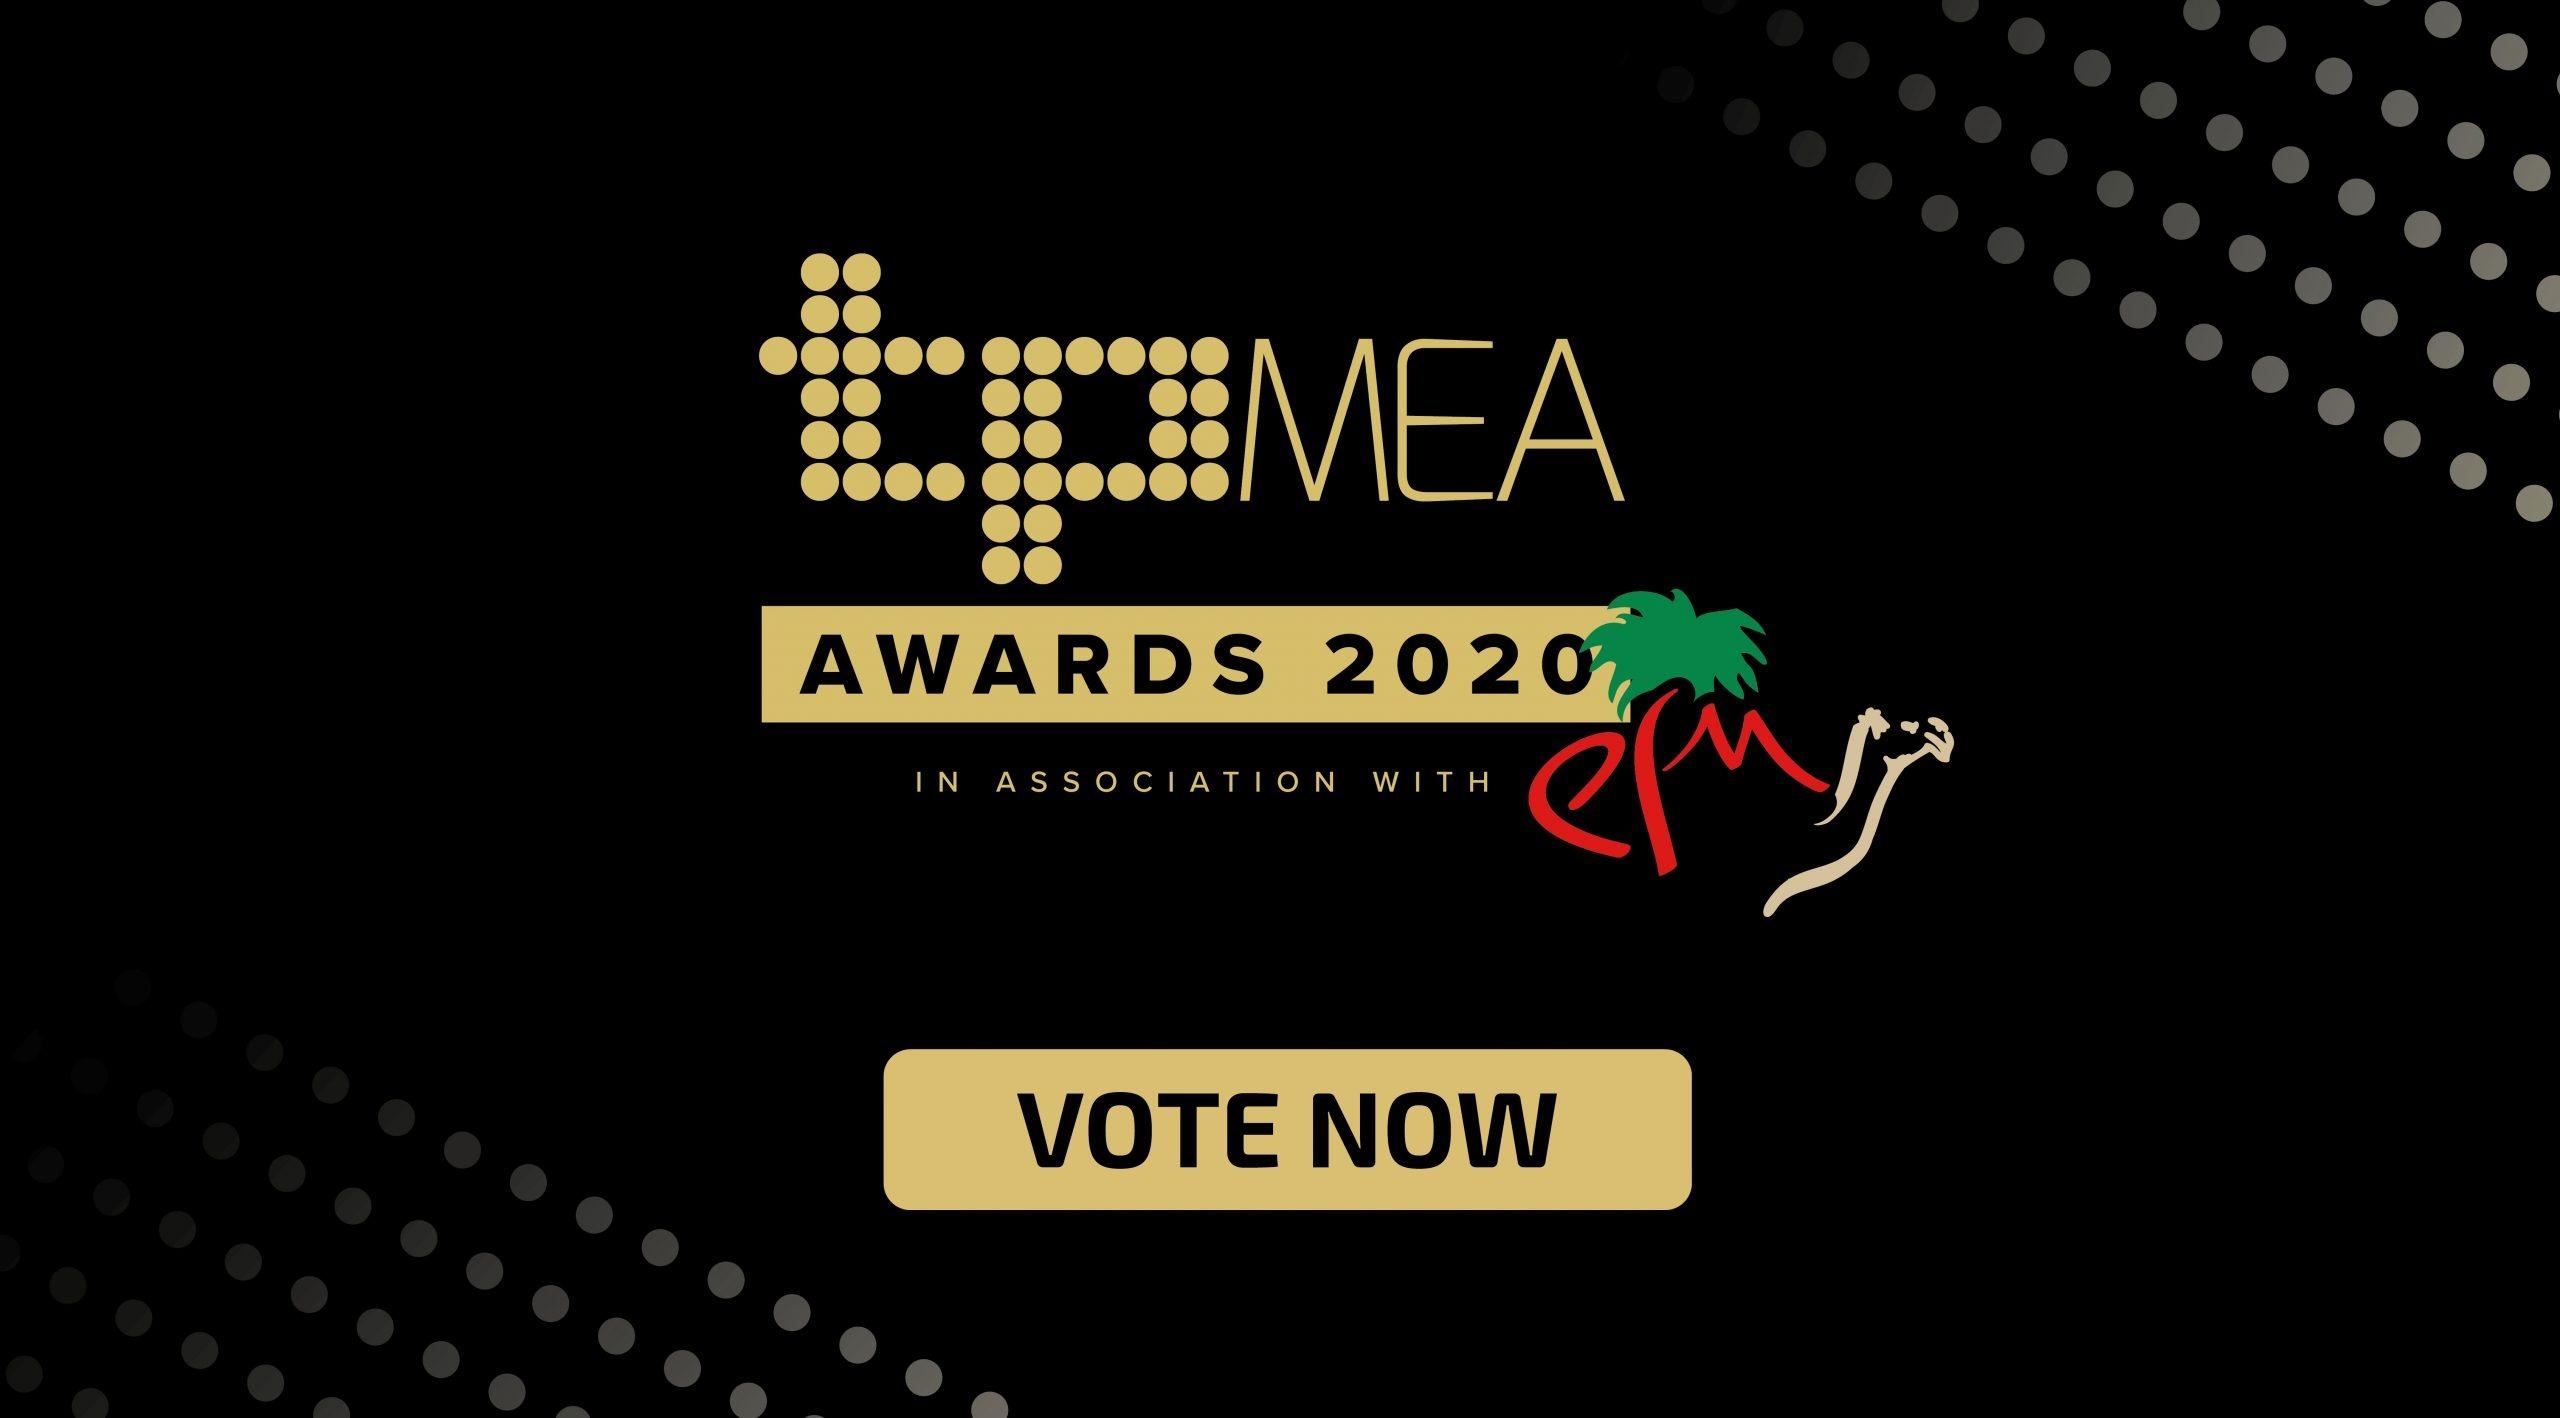 TPMEA Awards 2020 Vote Now